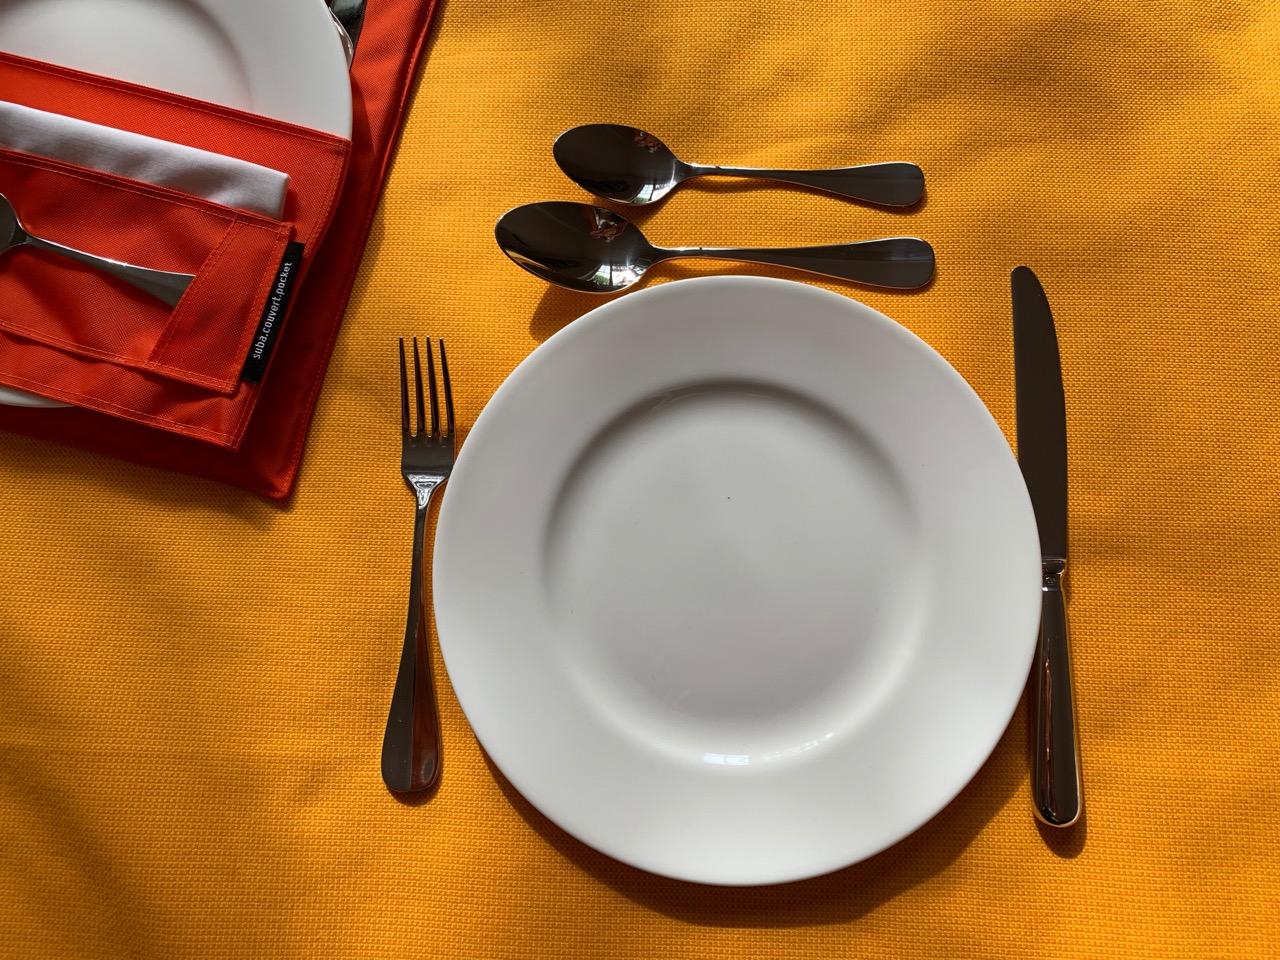 Suba Picnic-Makers suba.dinner4.2.pocket